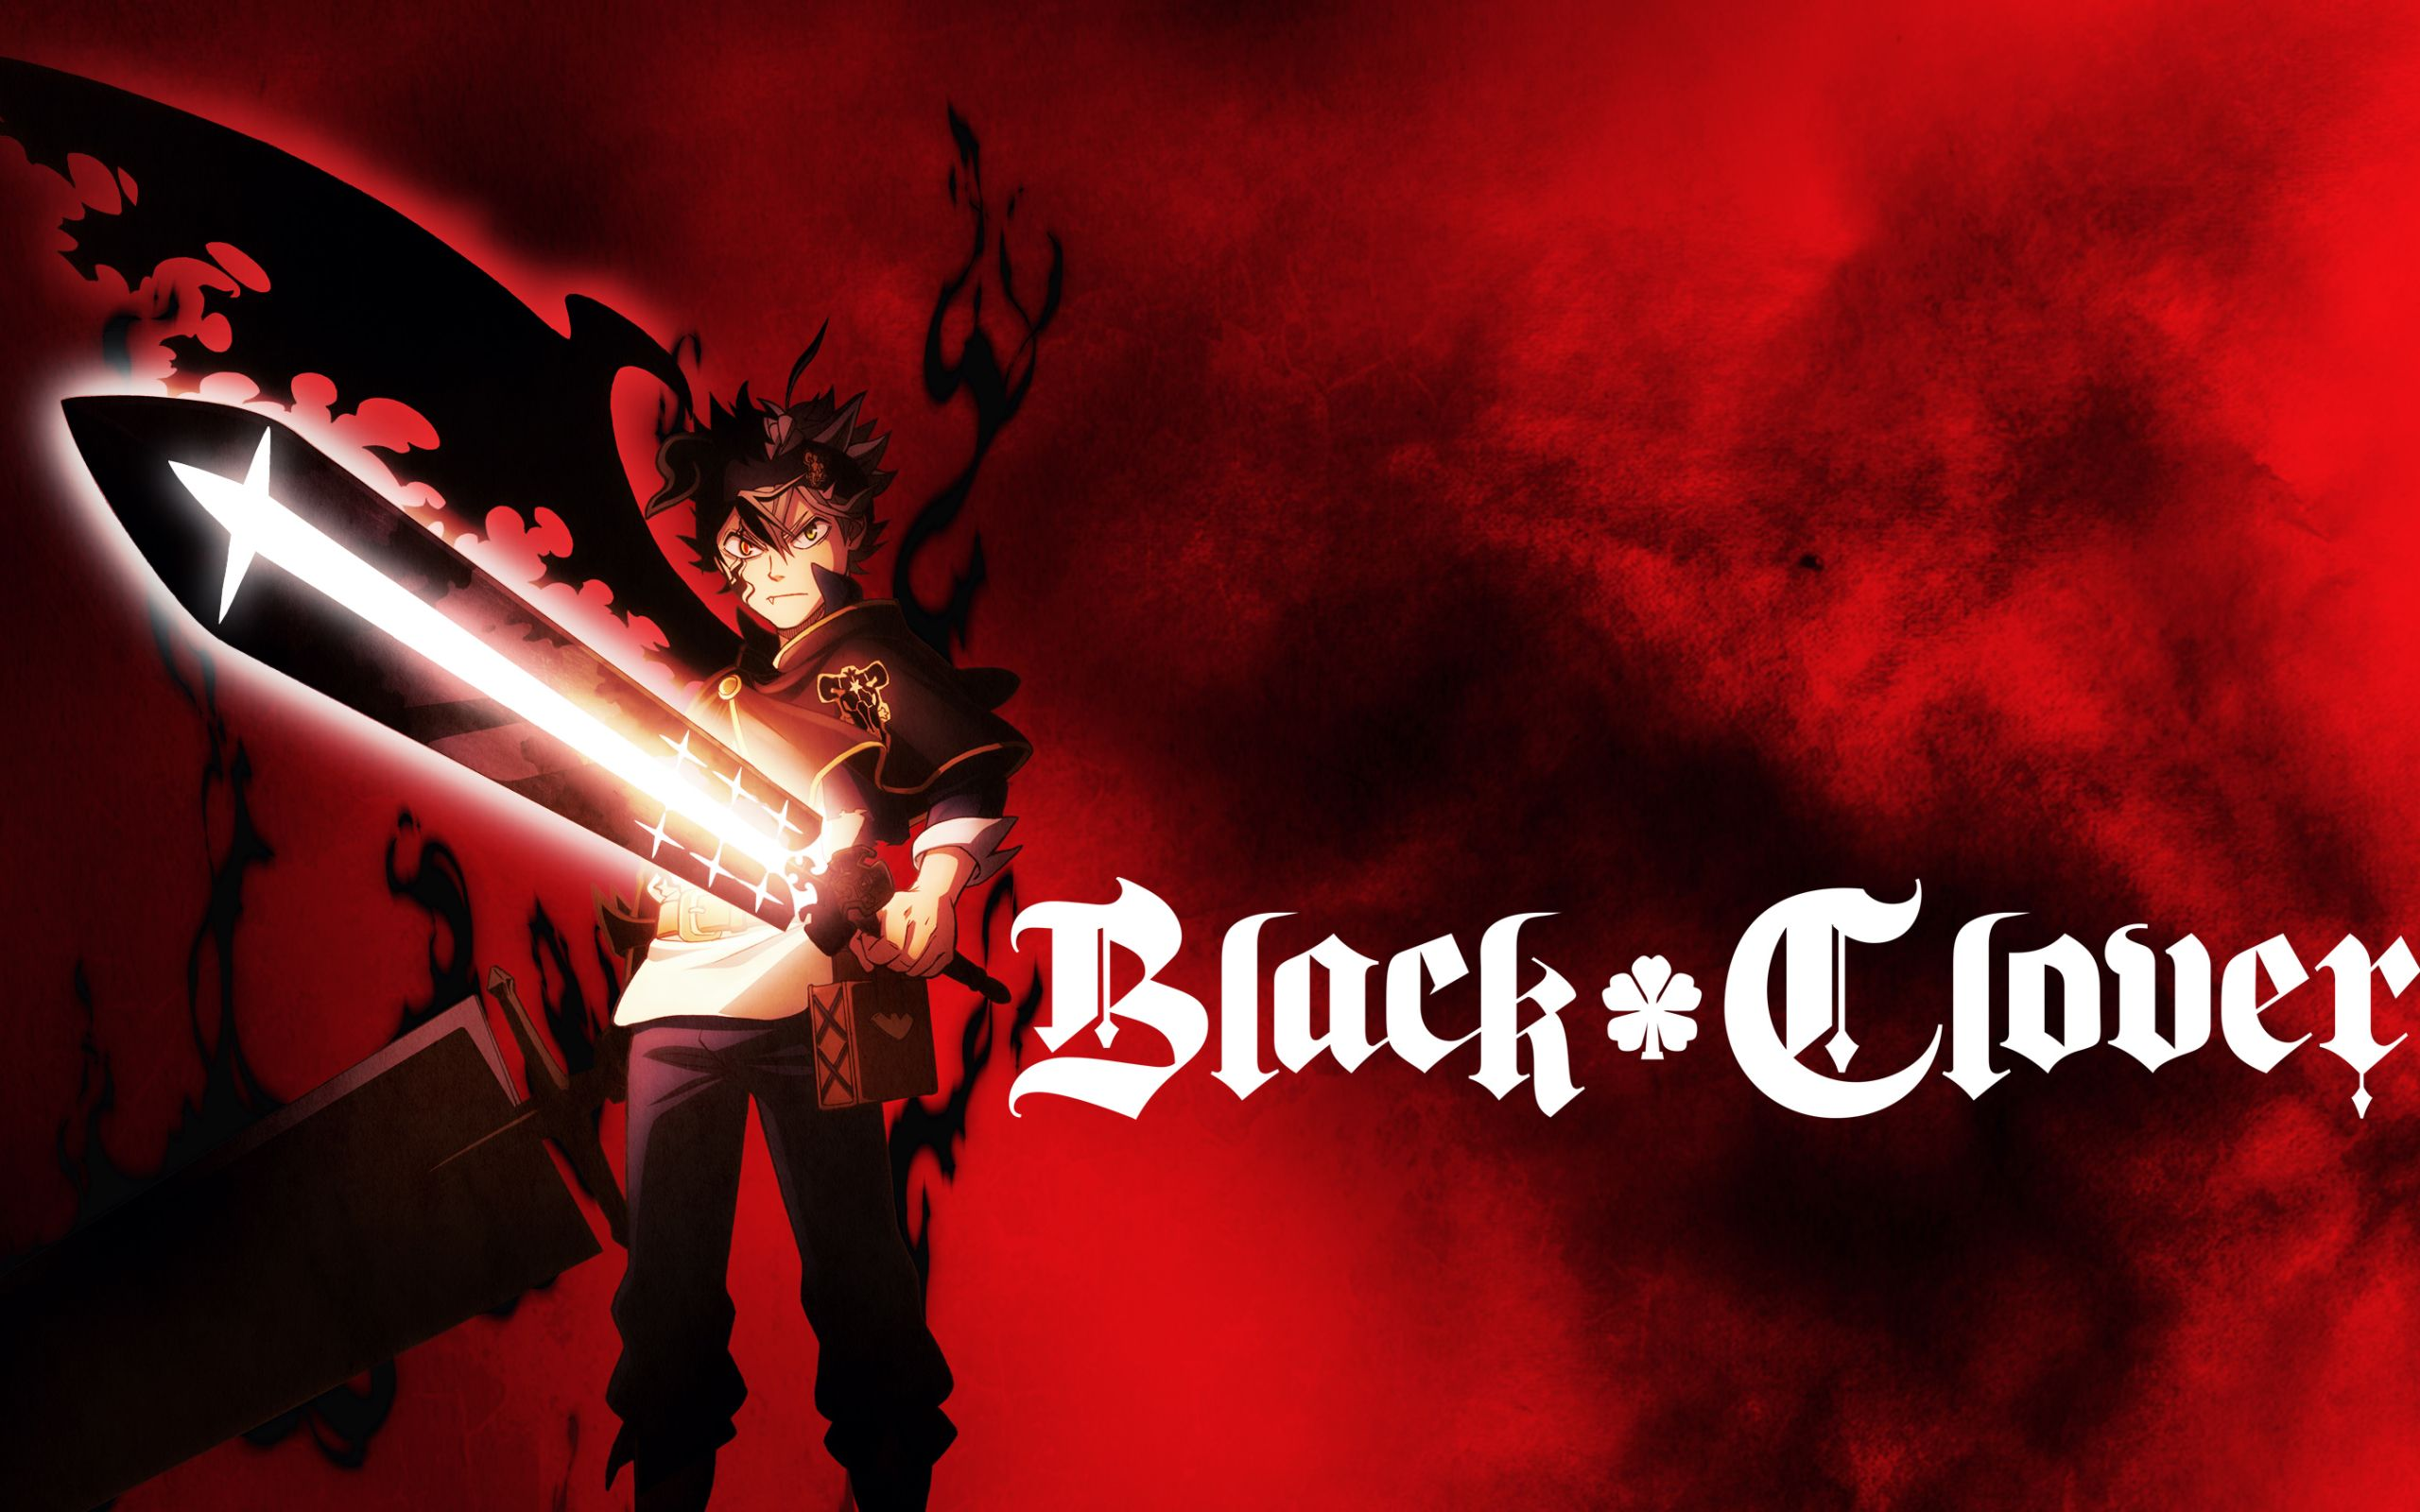 Asta Black Clover 4k Wallpapers Top Free Asta Black Clover 4k Backgrounds Wallpaperaccess